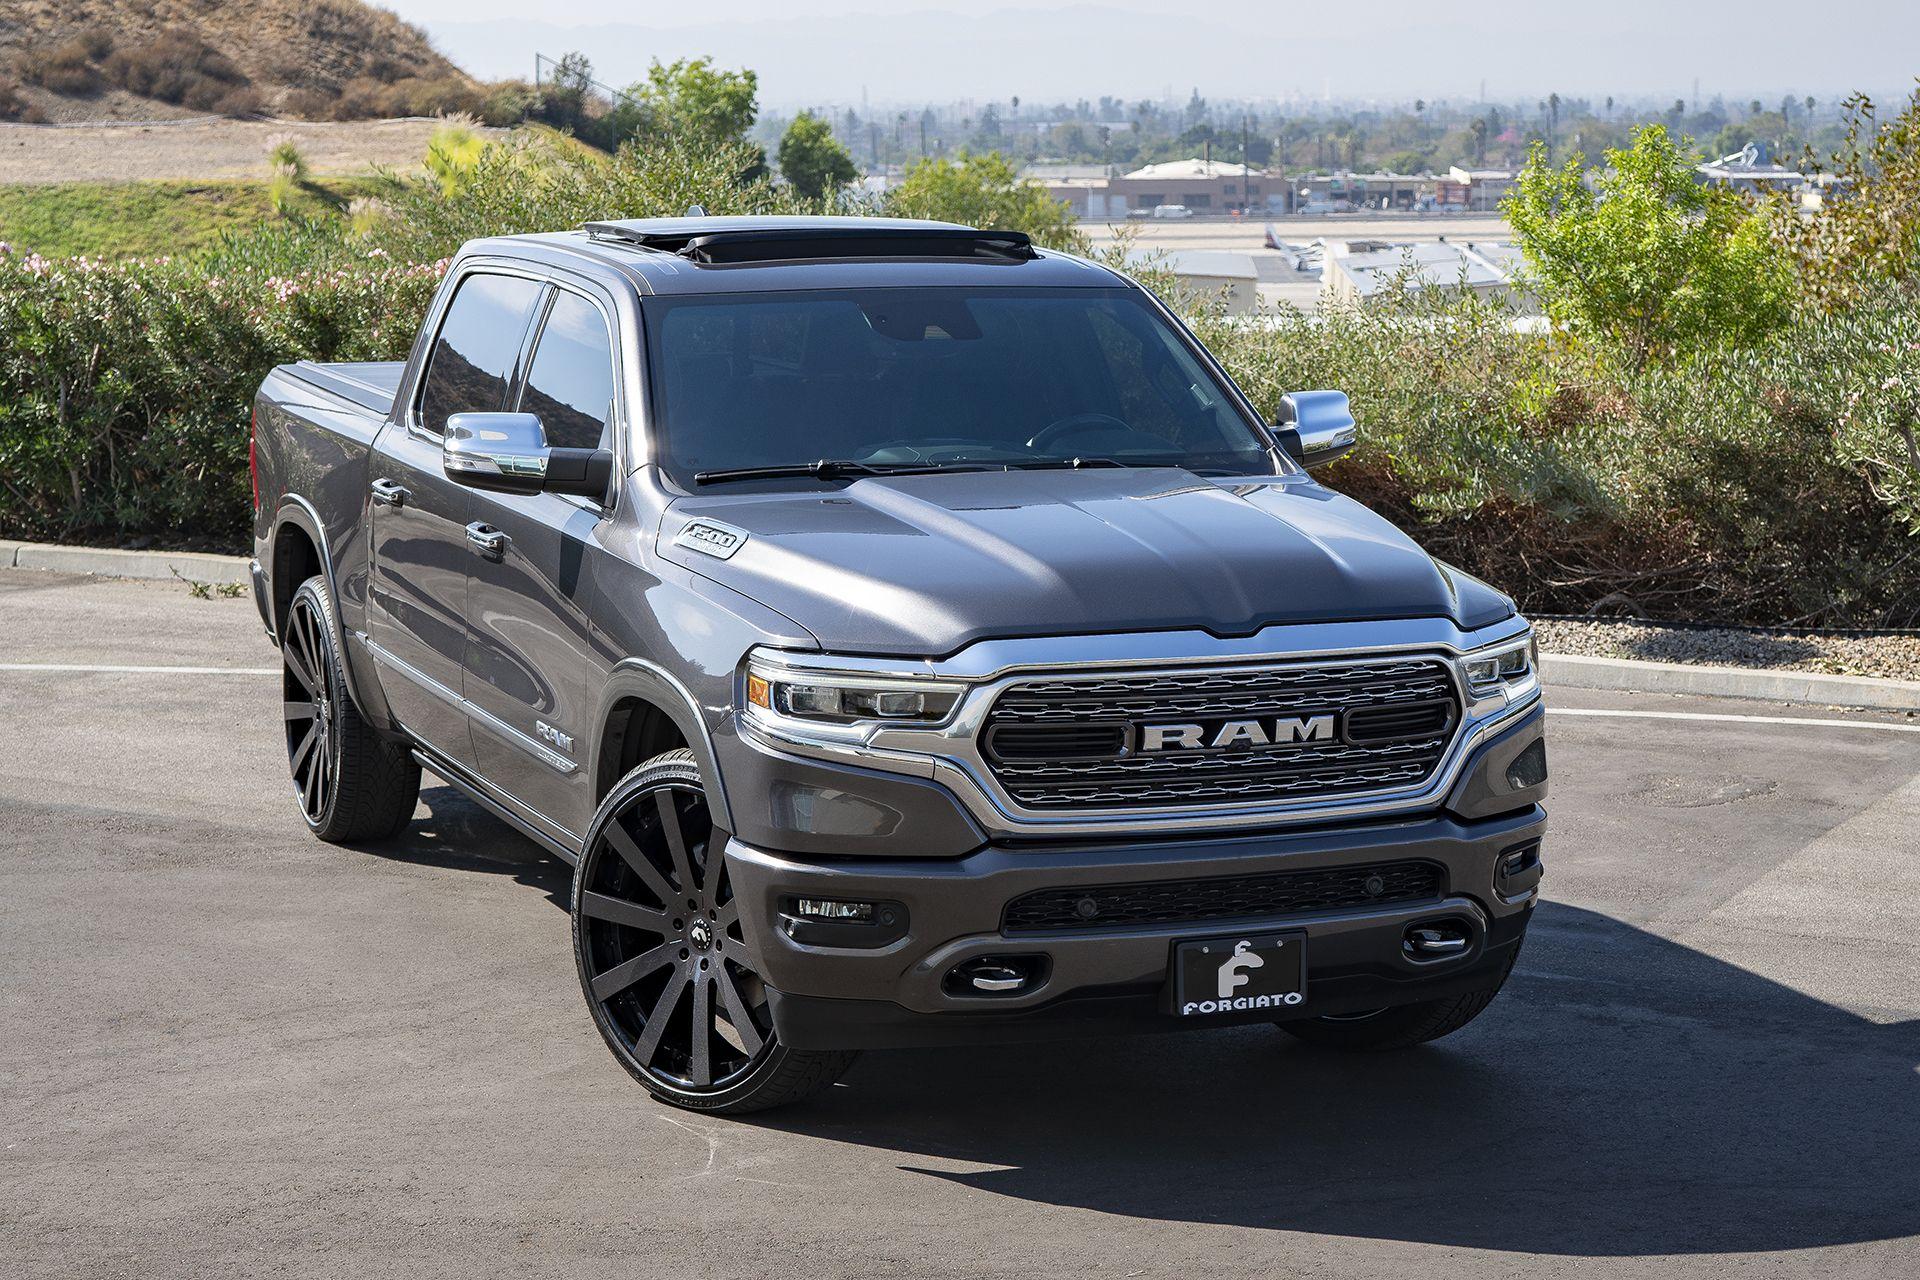 2019 Ram 1500 On Black Forgiato Rims Ram 1500 Dodge Trucks Ram Dodge Trucks